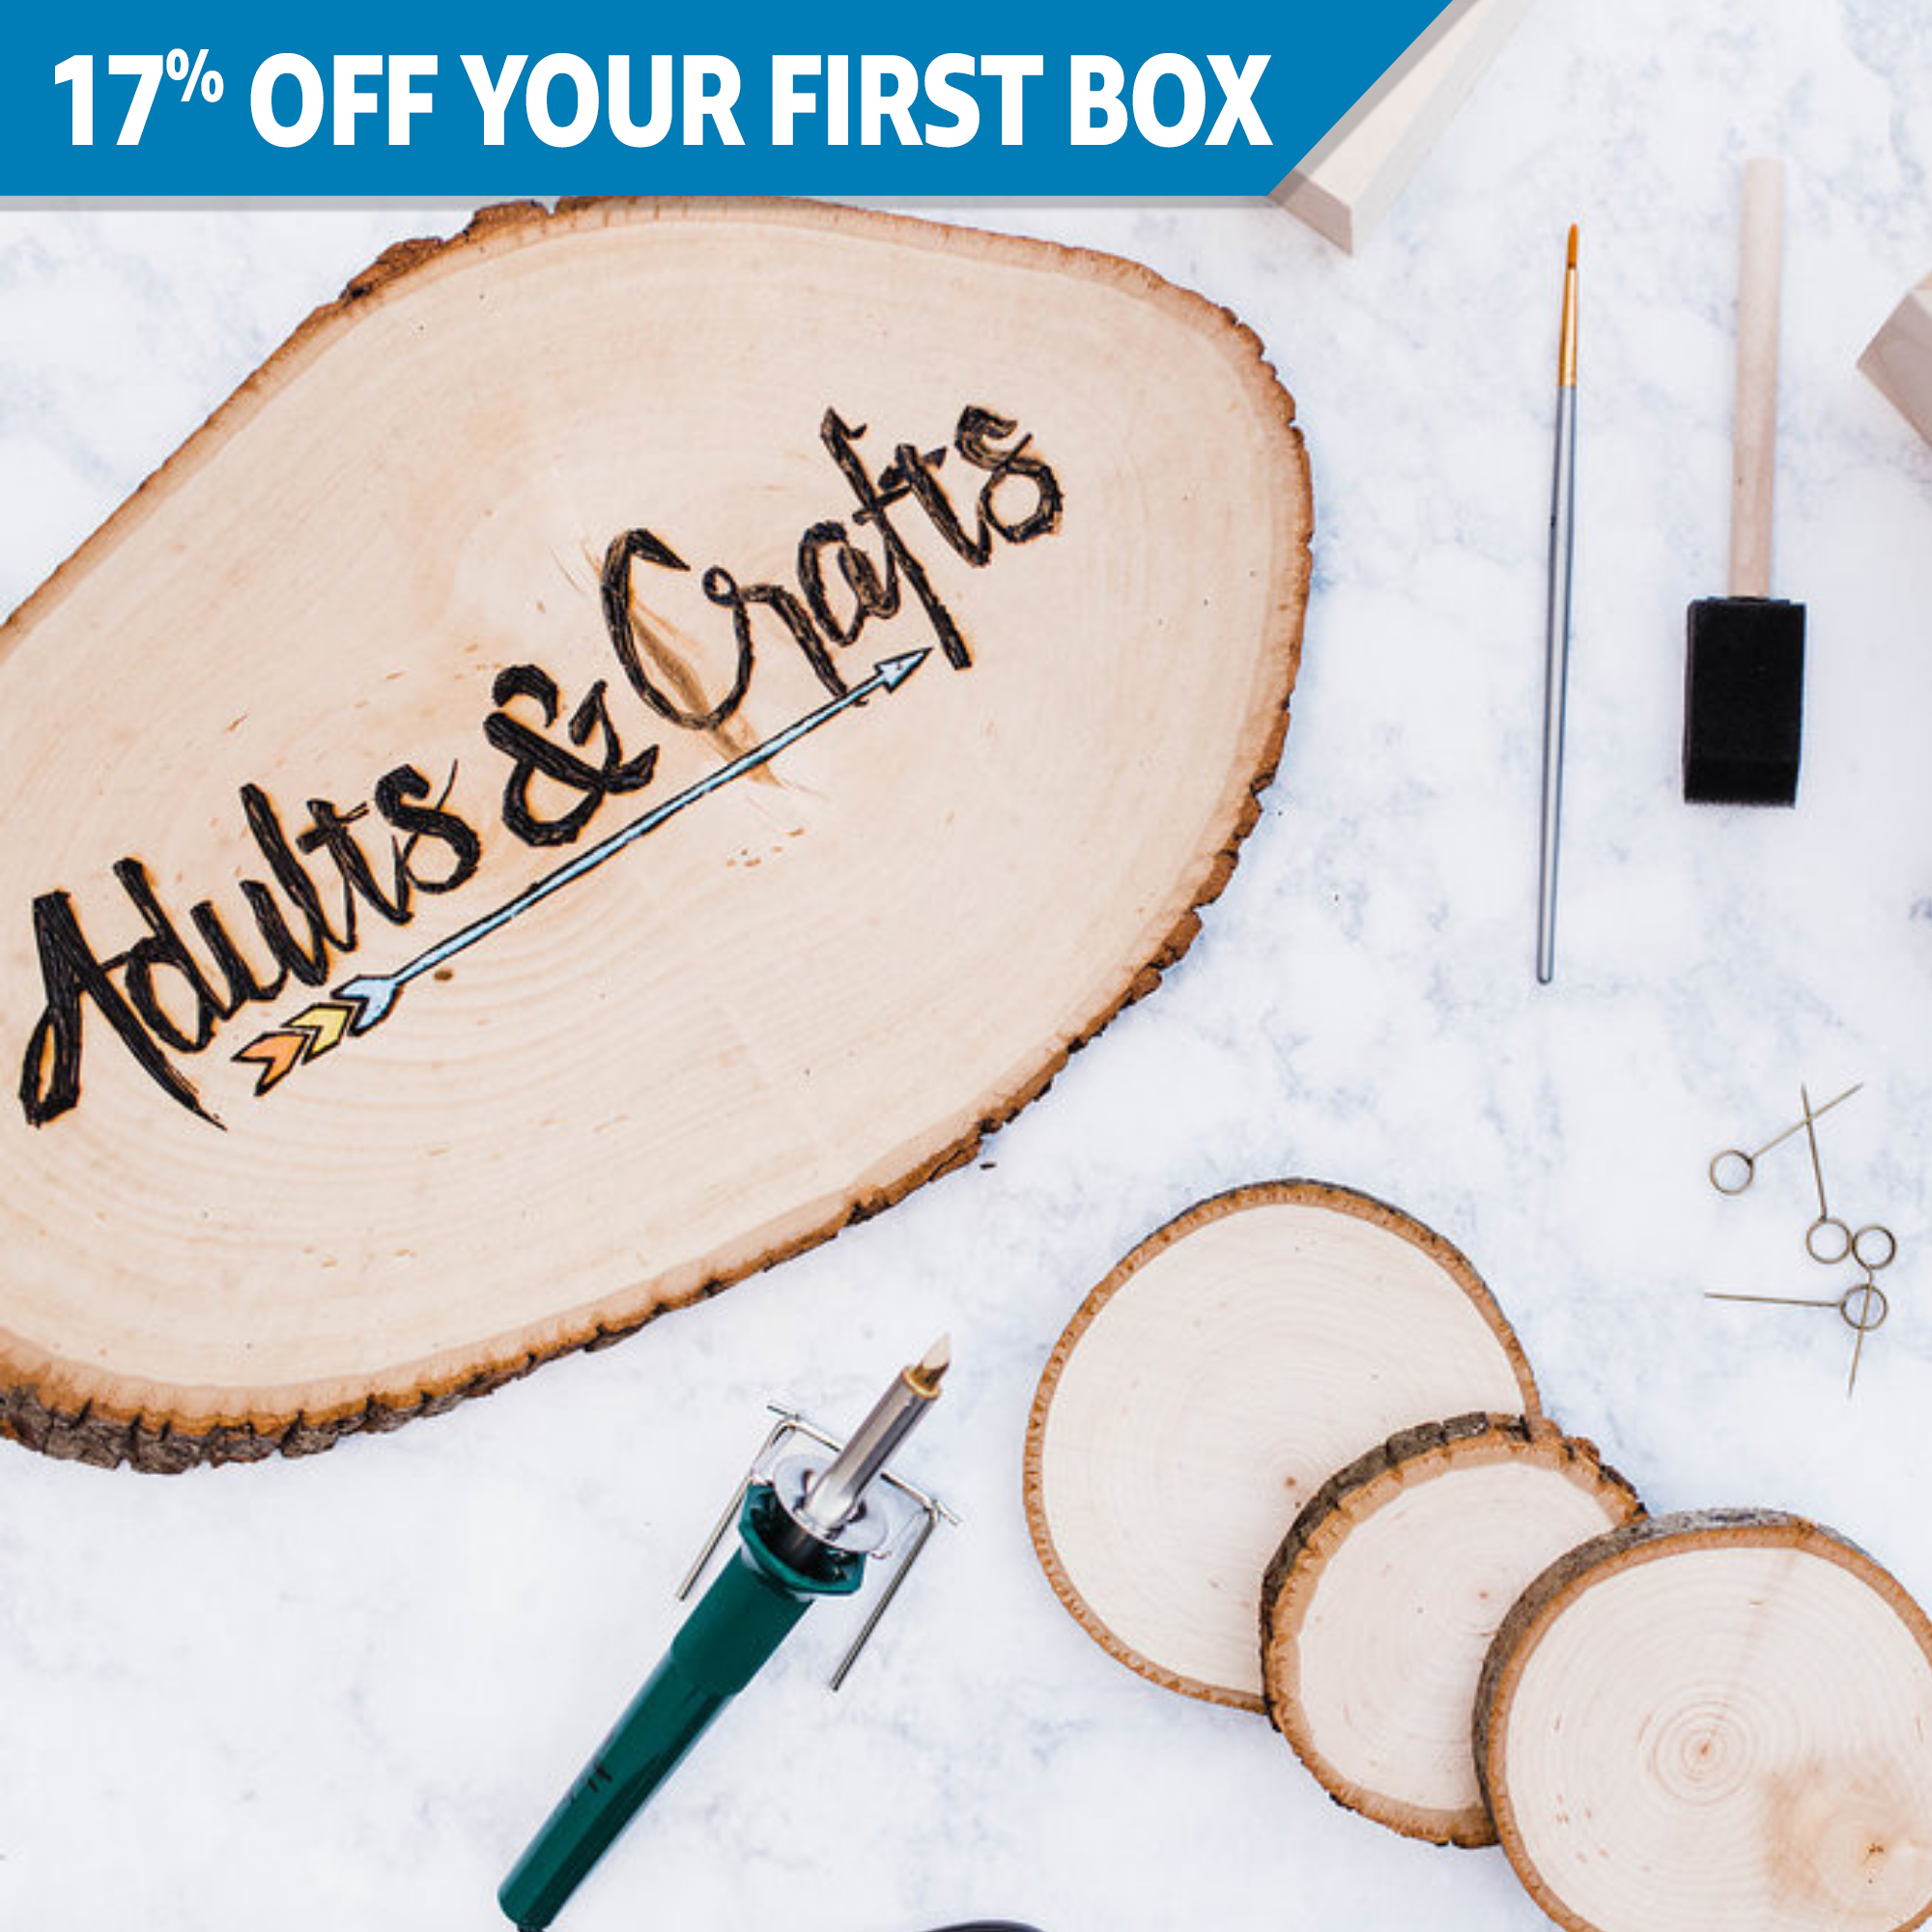 Adults & Crafts - DIY Craft Kits Subscription Box